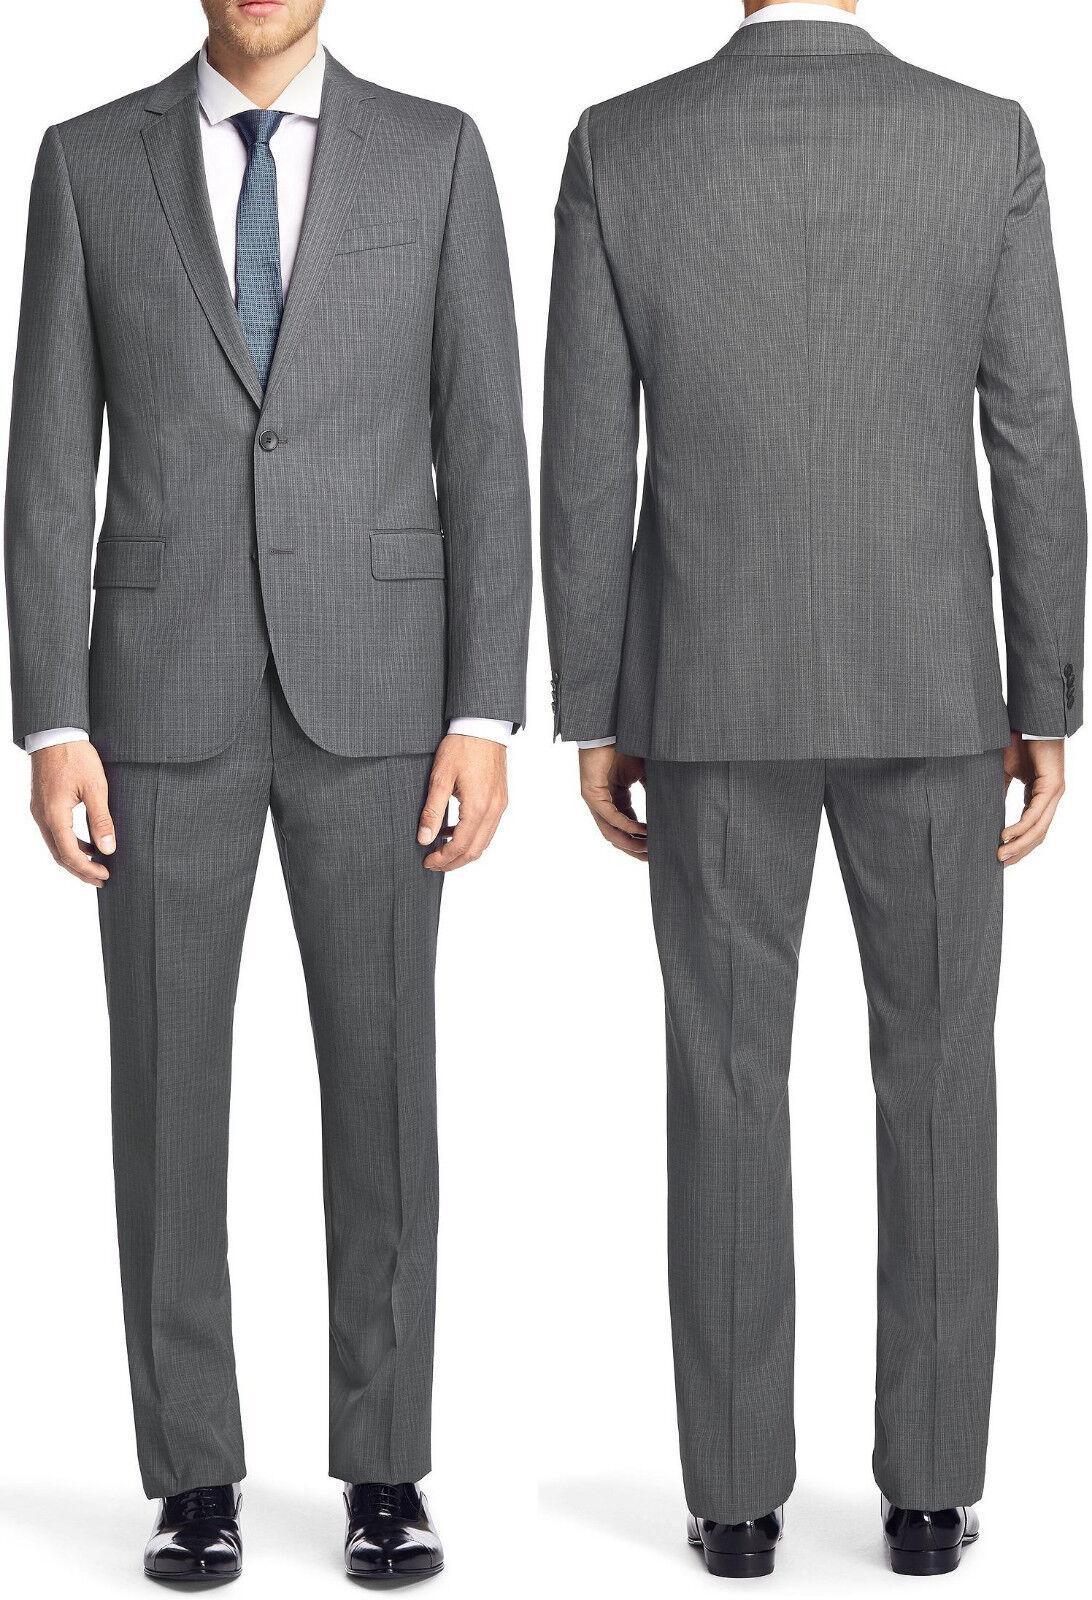 NWT Hugo (Hugo Boss) 100 Super Wool Luxurious Slim Fit Business Suit 38R